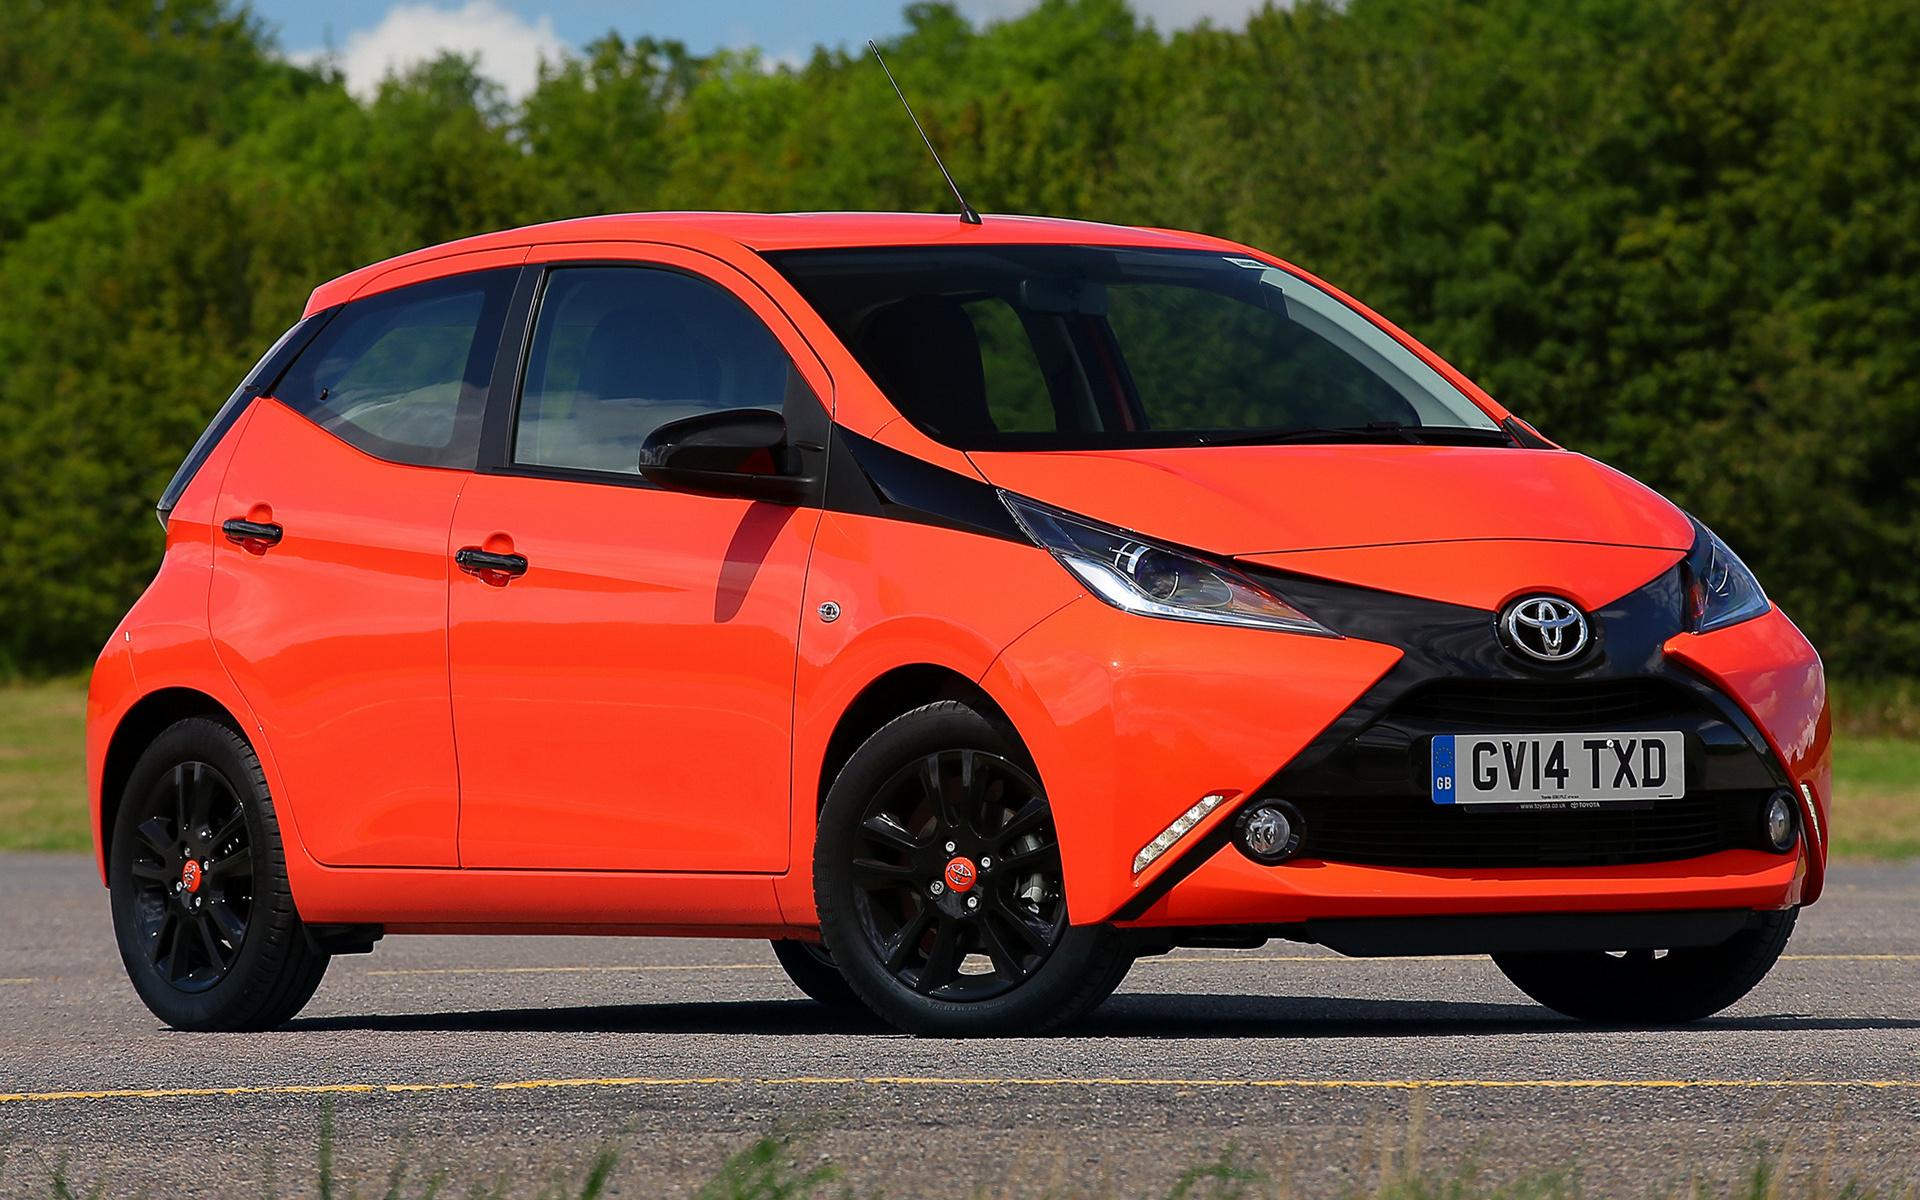 2014 Toyota Aygo x cite 5 door UK   Wallpapers and HD Images 1920x1200